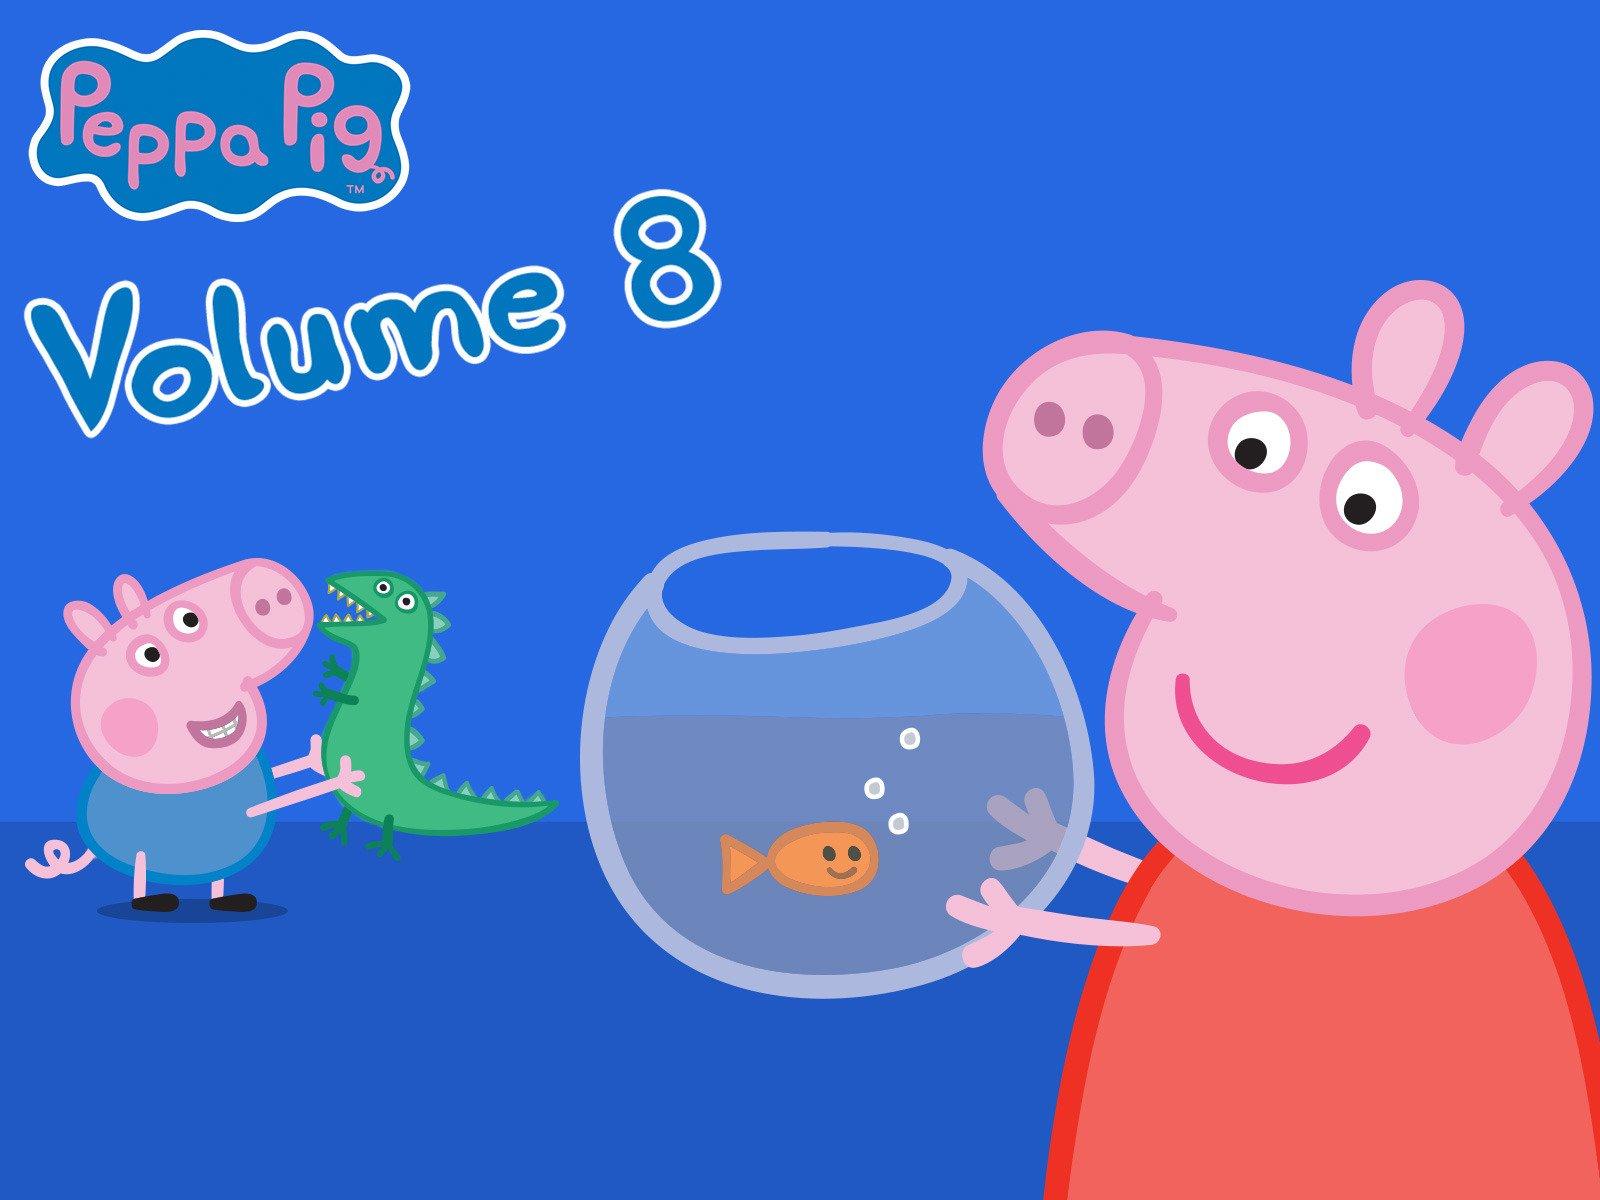 Amazon co uk: Watch Peppa Pig - Volume 8 | Prime Video